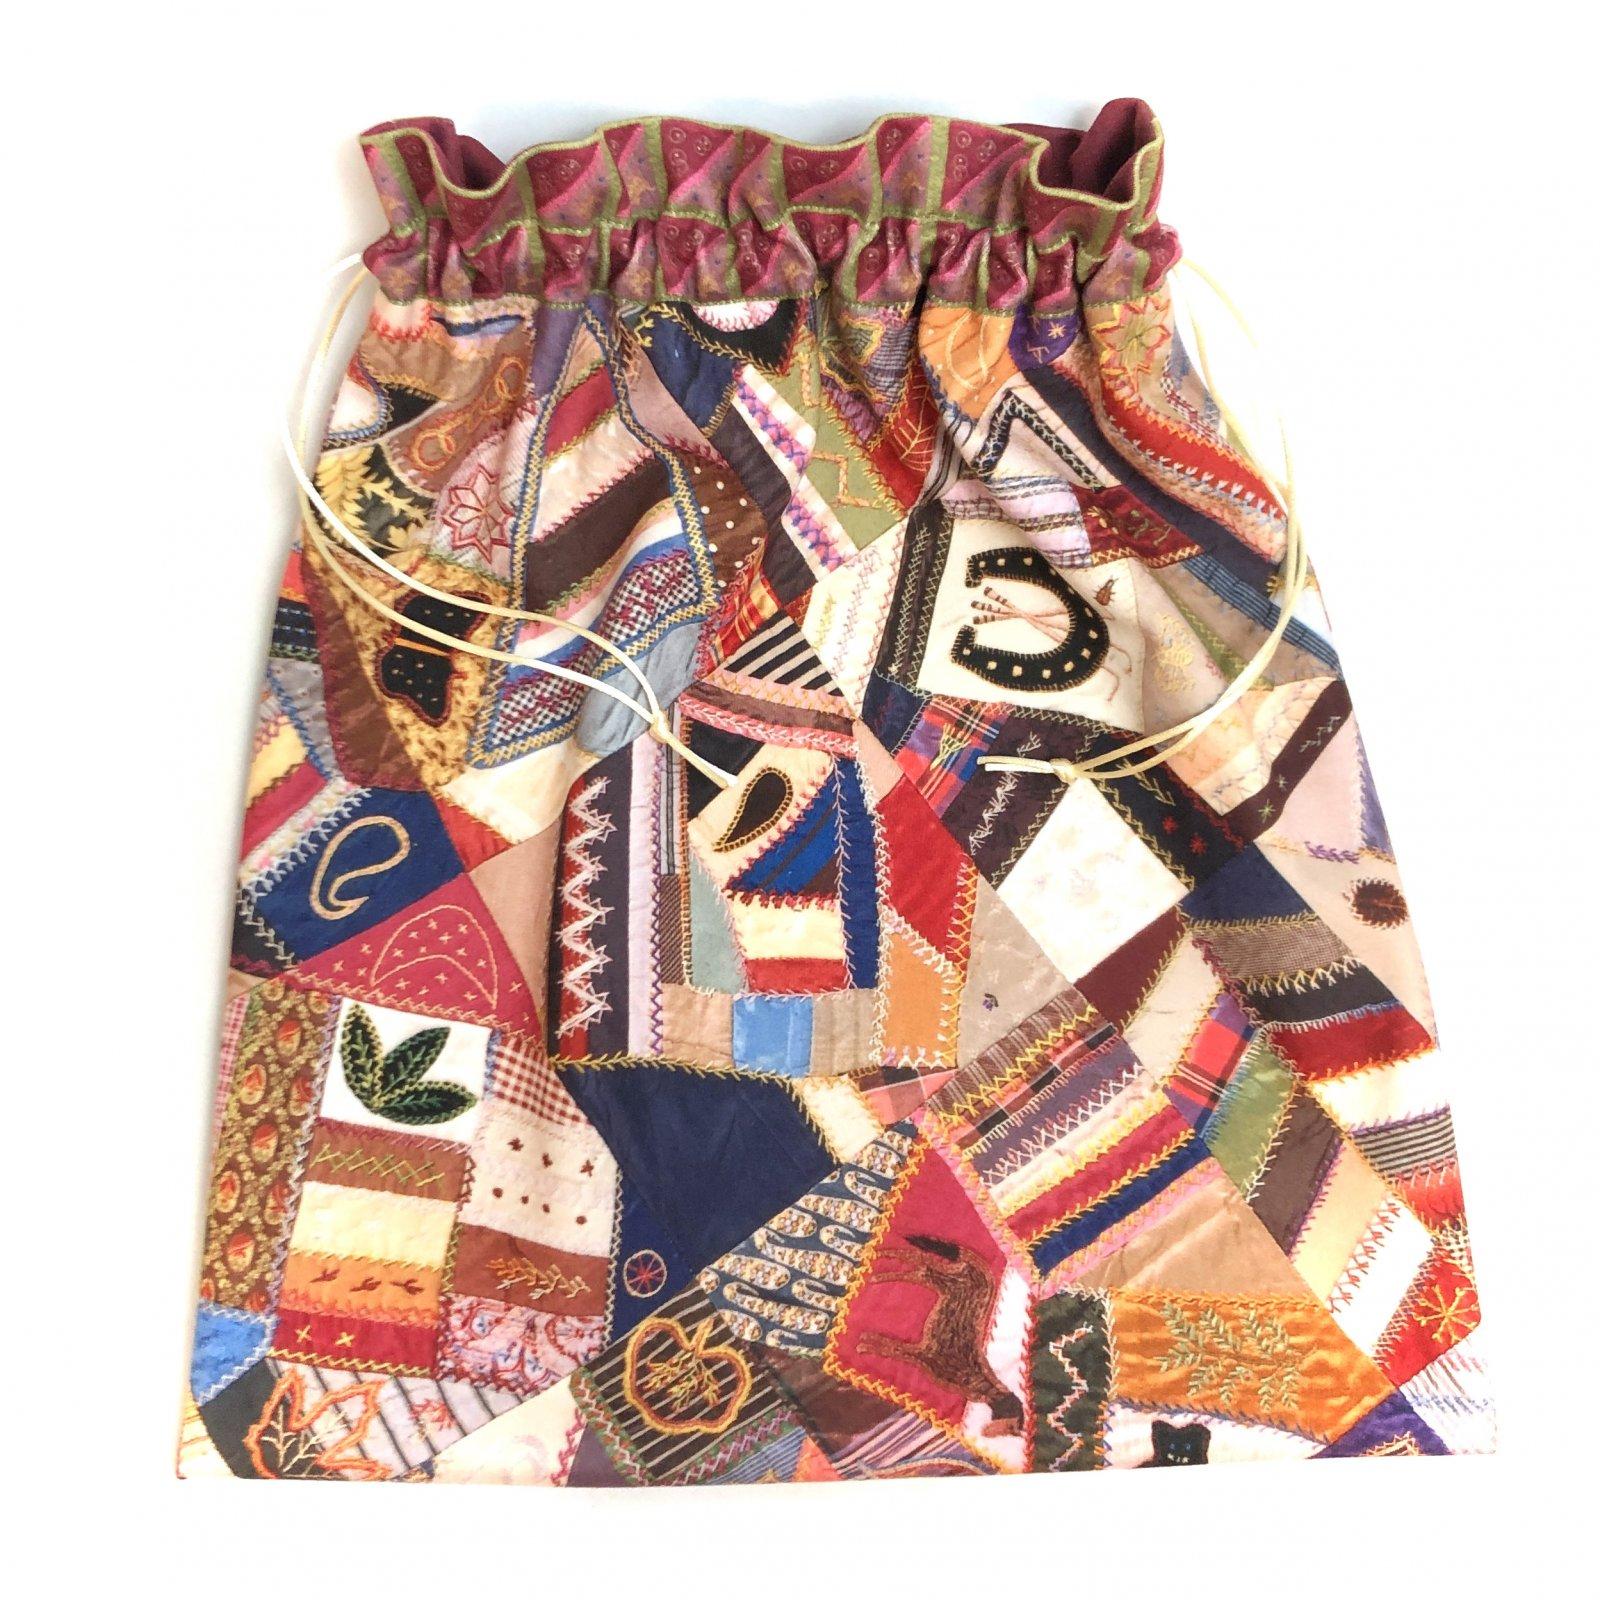 Nostalgic Crazy Quilt - Makers' Exclusive Drawstring Project Bag